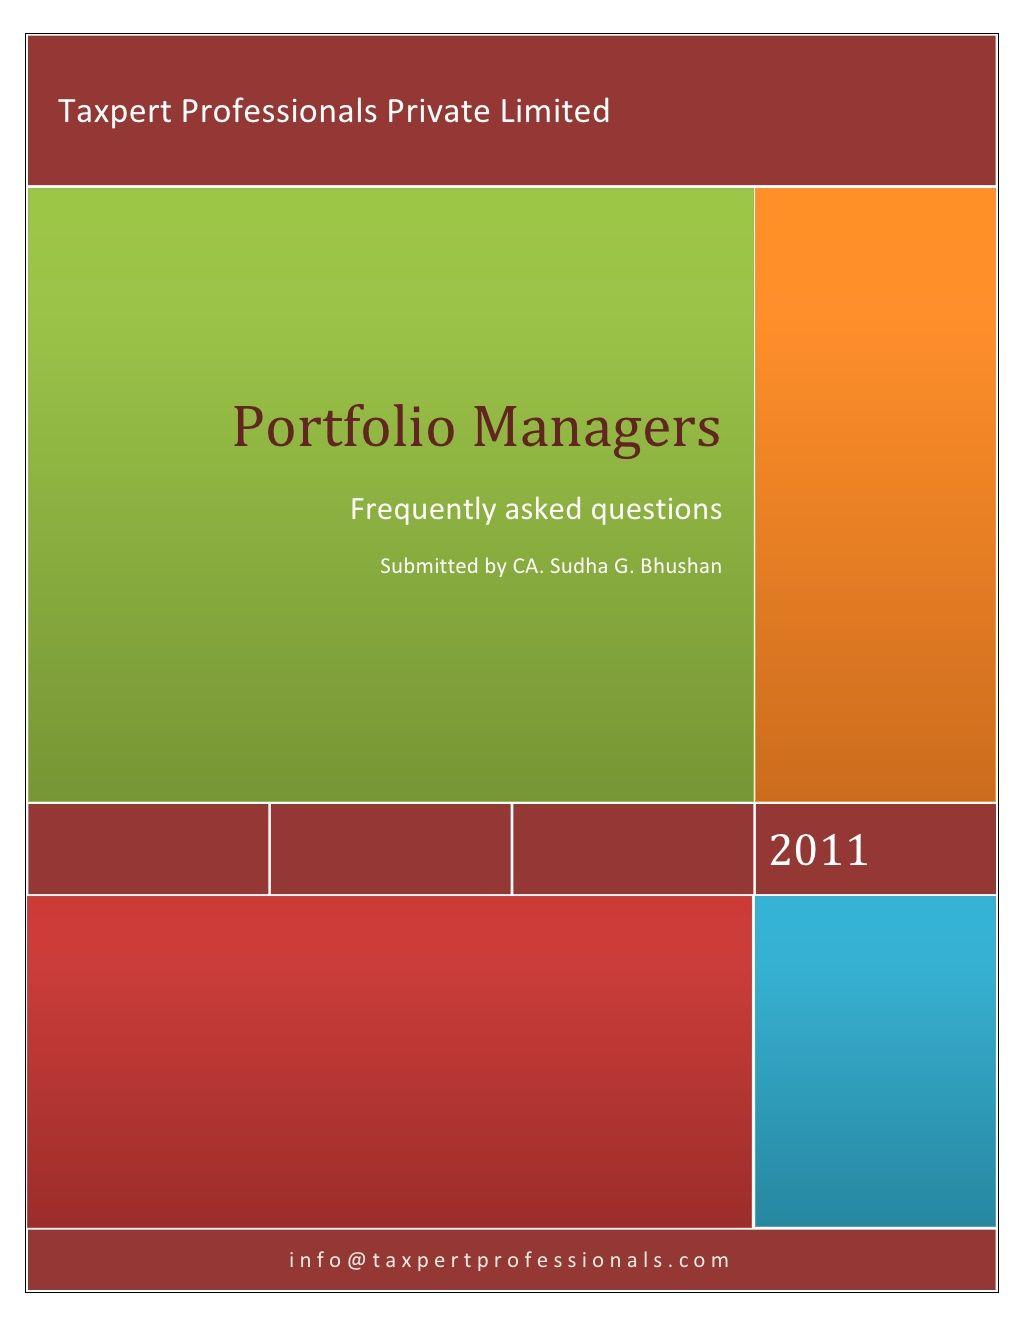 Portfolio Manager By Taxpert Professionals Via Slideshare